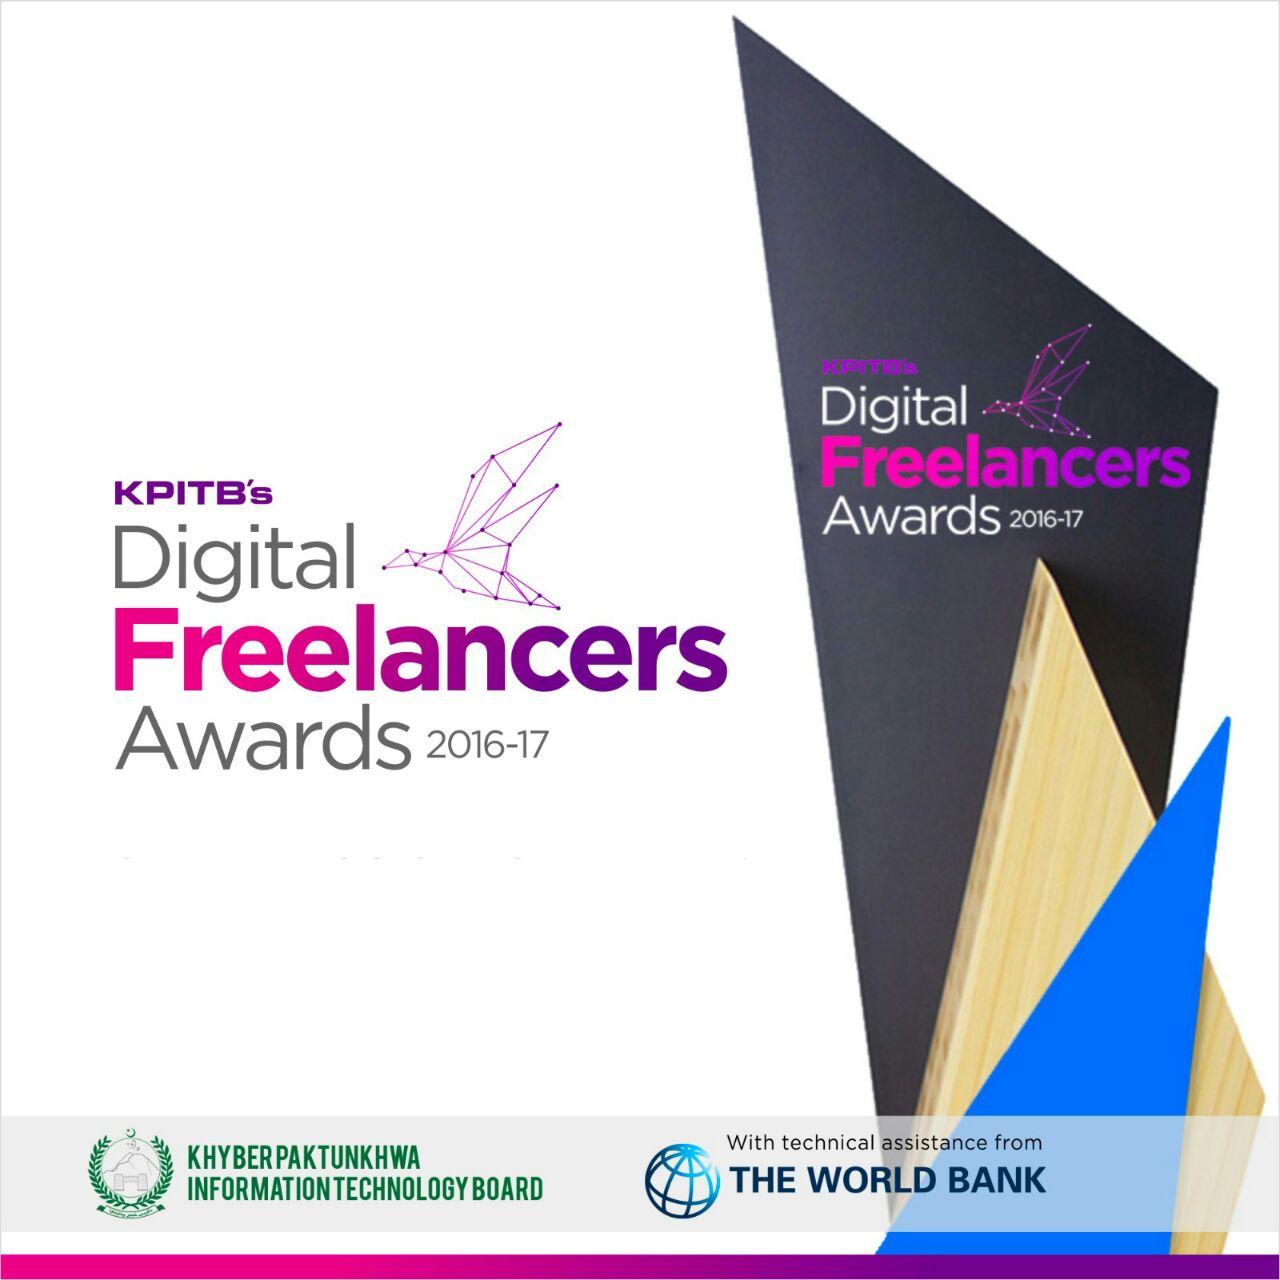 KPITB Announces Digital Freelancers Awards 2016-17